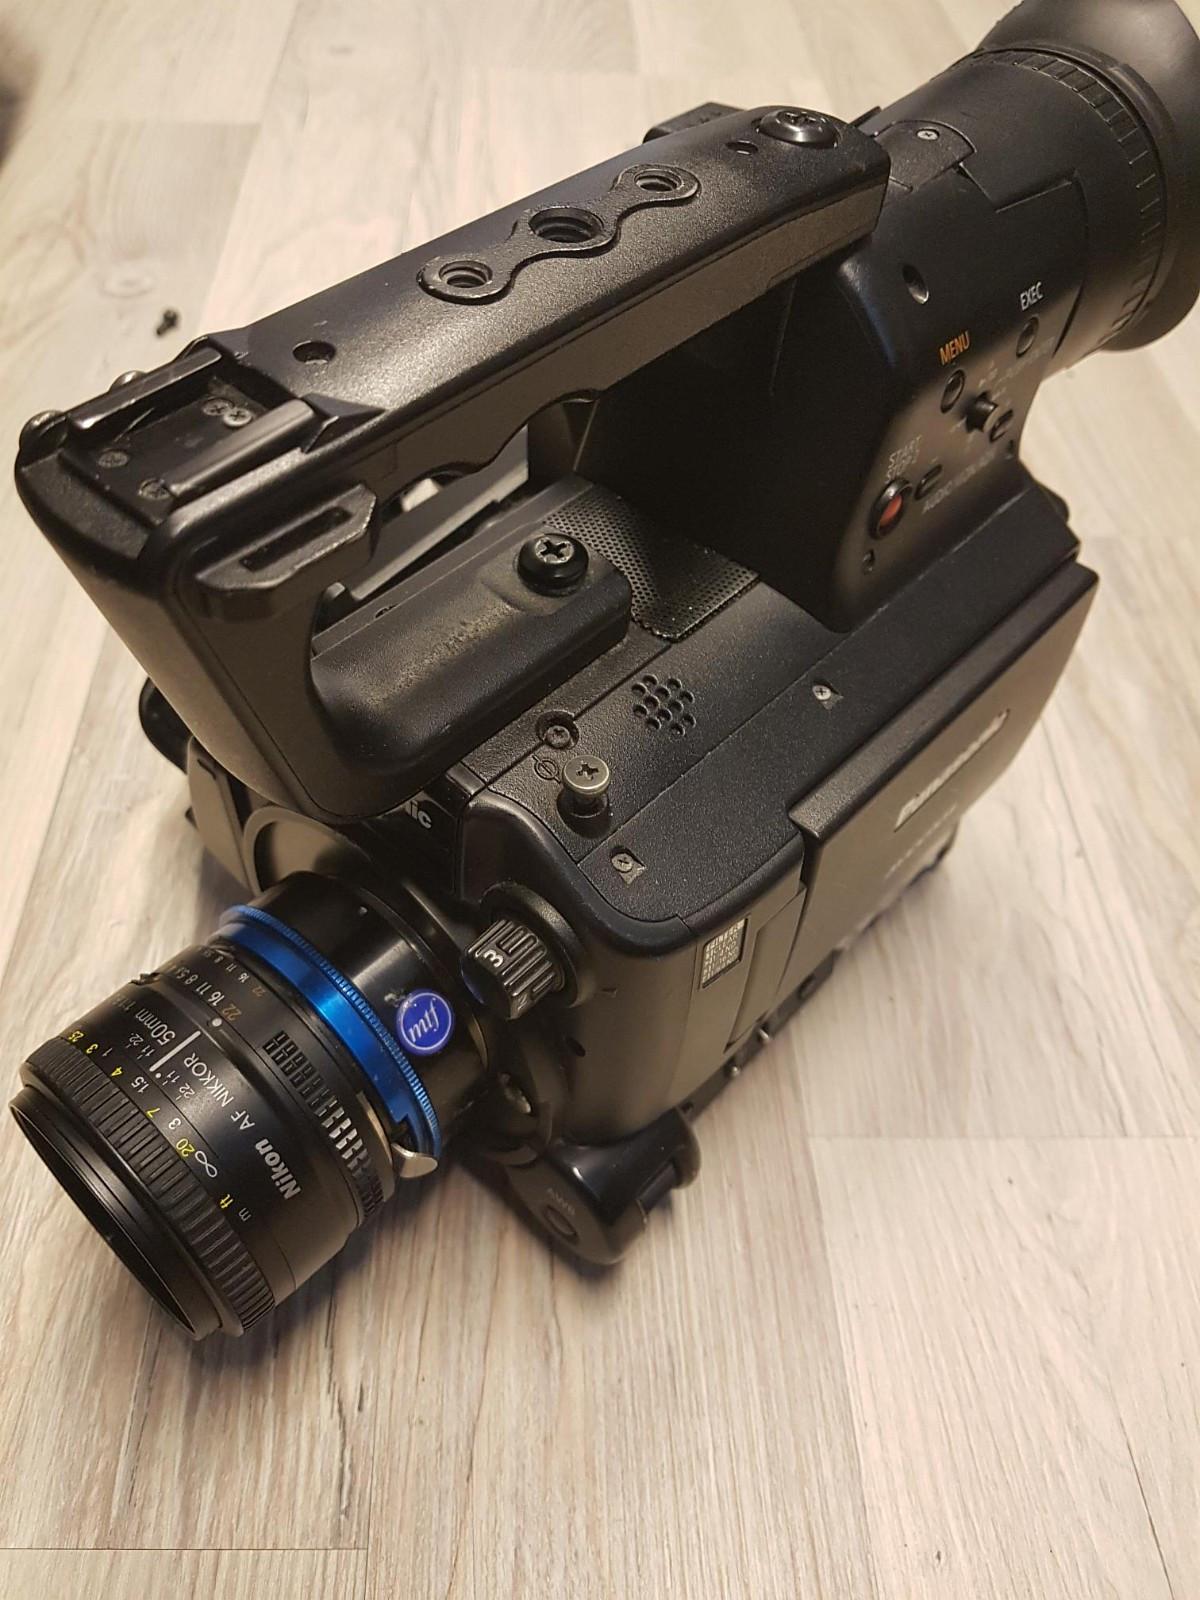 Panasonic AG AF100 m/ mtf adapter + 2 objektiv - Frekhaug  - Godt brukt HD-kamera med adapter for Nikon-optikk. Medfølger Sigma 20mm 1,8 og Nikon 50mm f 1,8. To batterier, lader og strømadapter. Godt pakket i Pelican 1550 koffert. Hentes i Bergen.  Selger to kameraer som kan selges samlet til en god p - Frekhaug